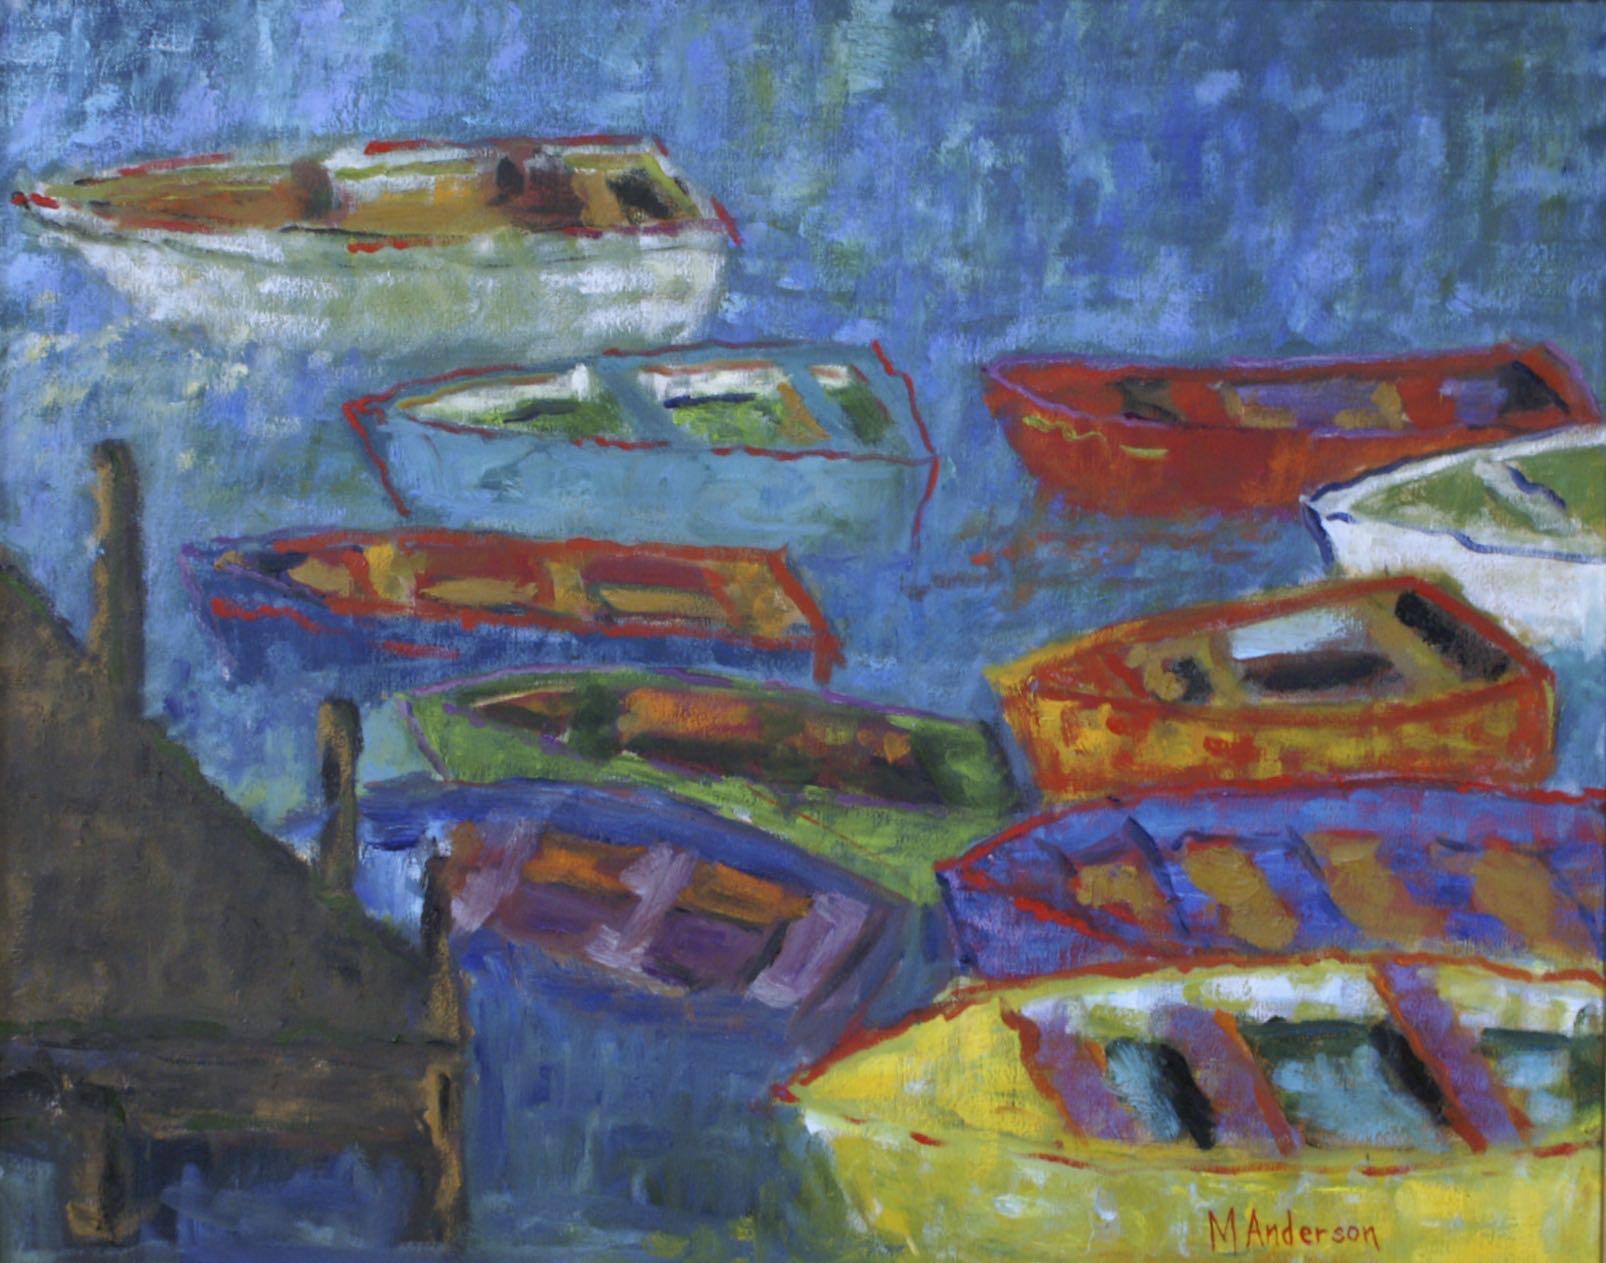 Fishing Dock - Sold